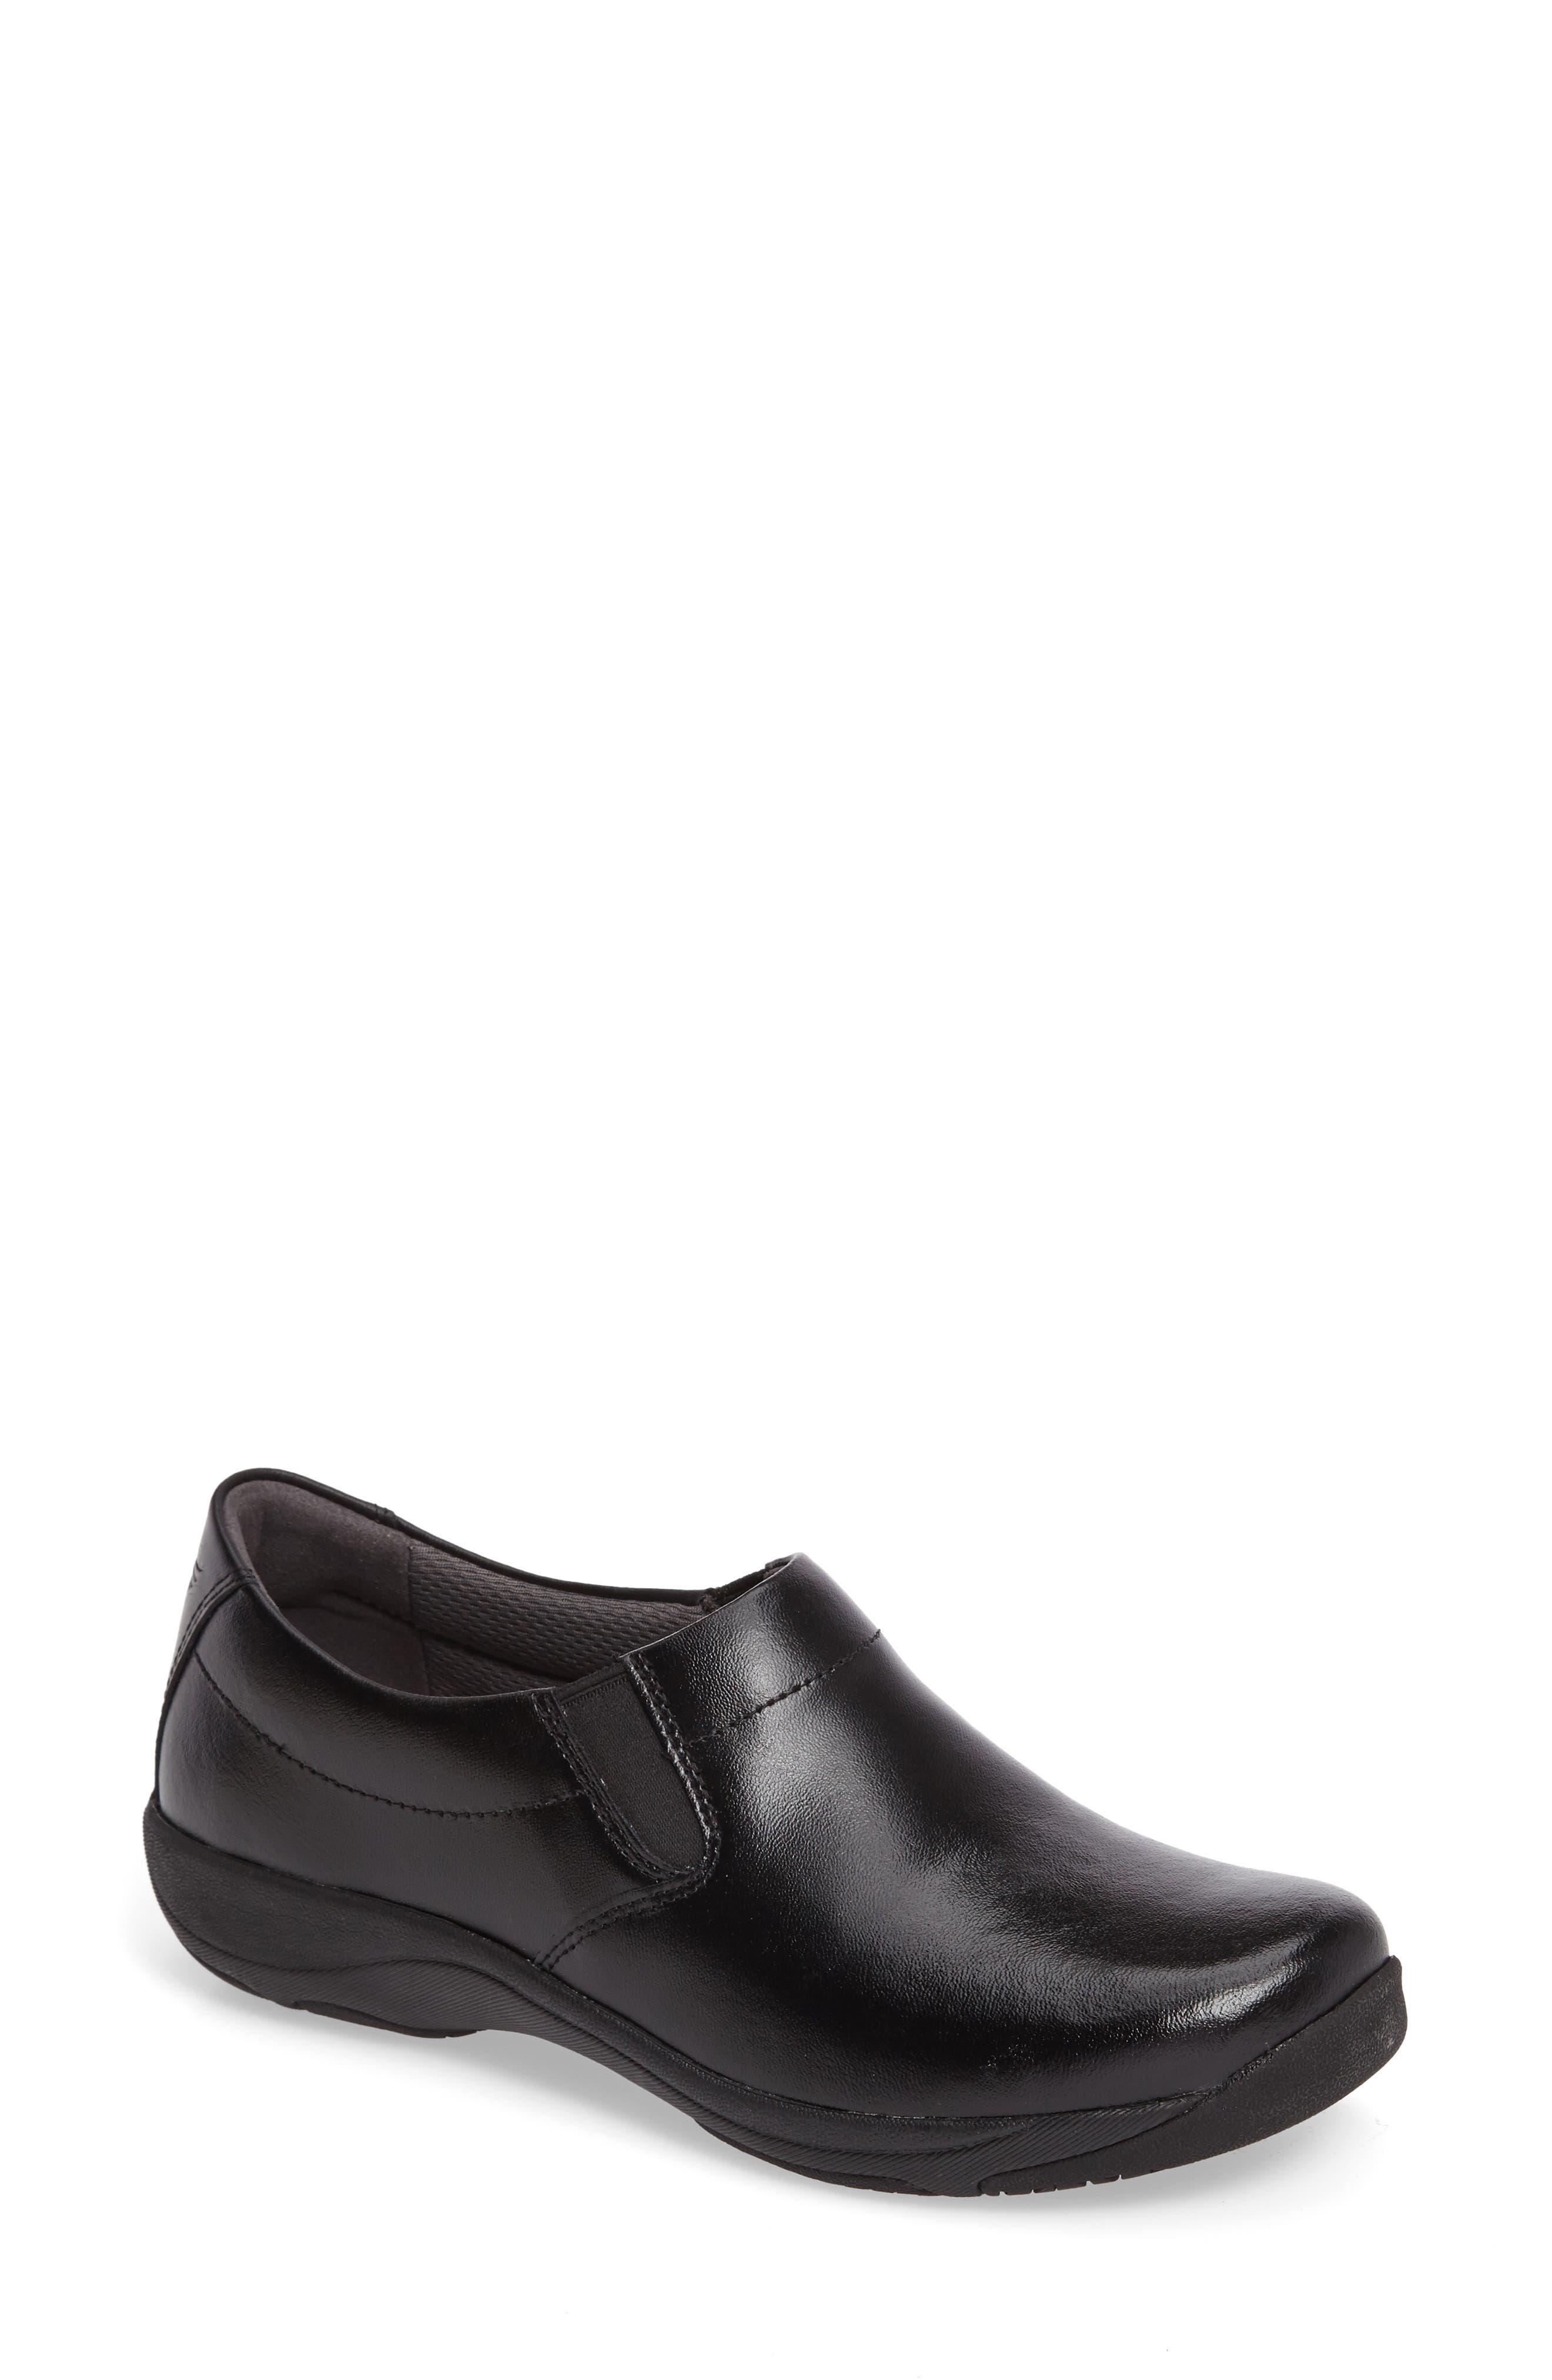 DANSKO Ellie Slip-On Sneaker, Main, color, BLACK LEATHER